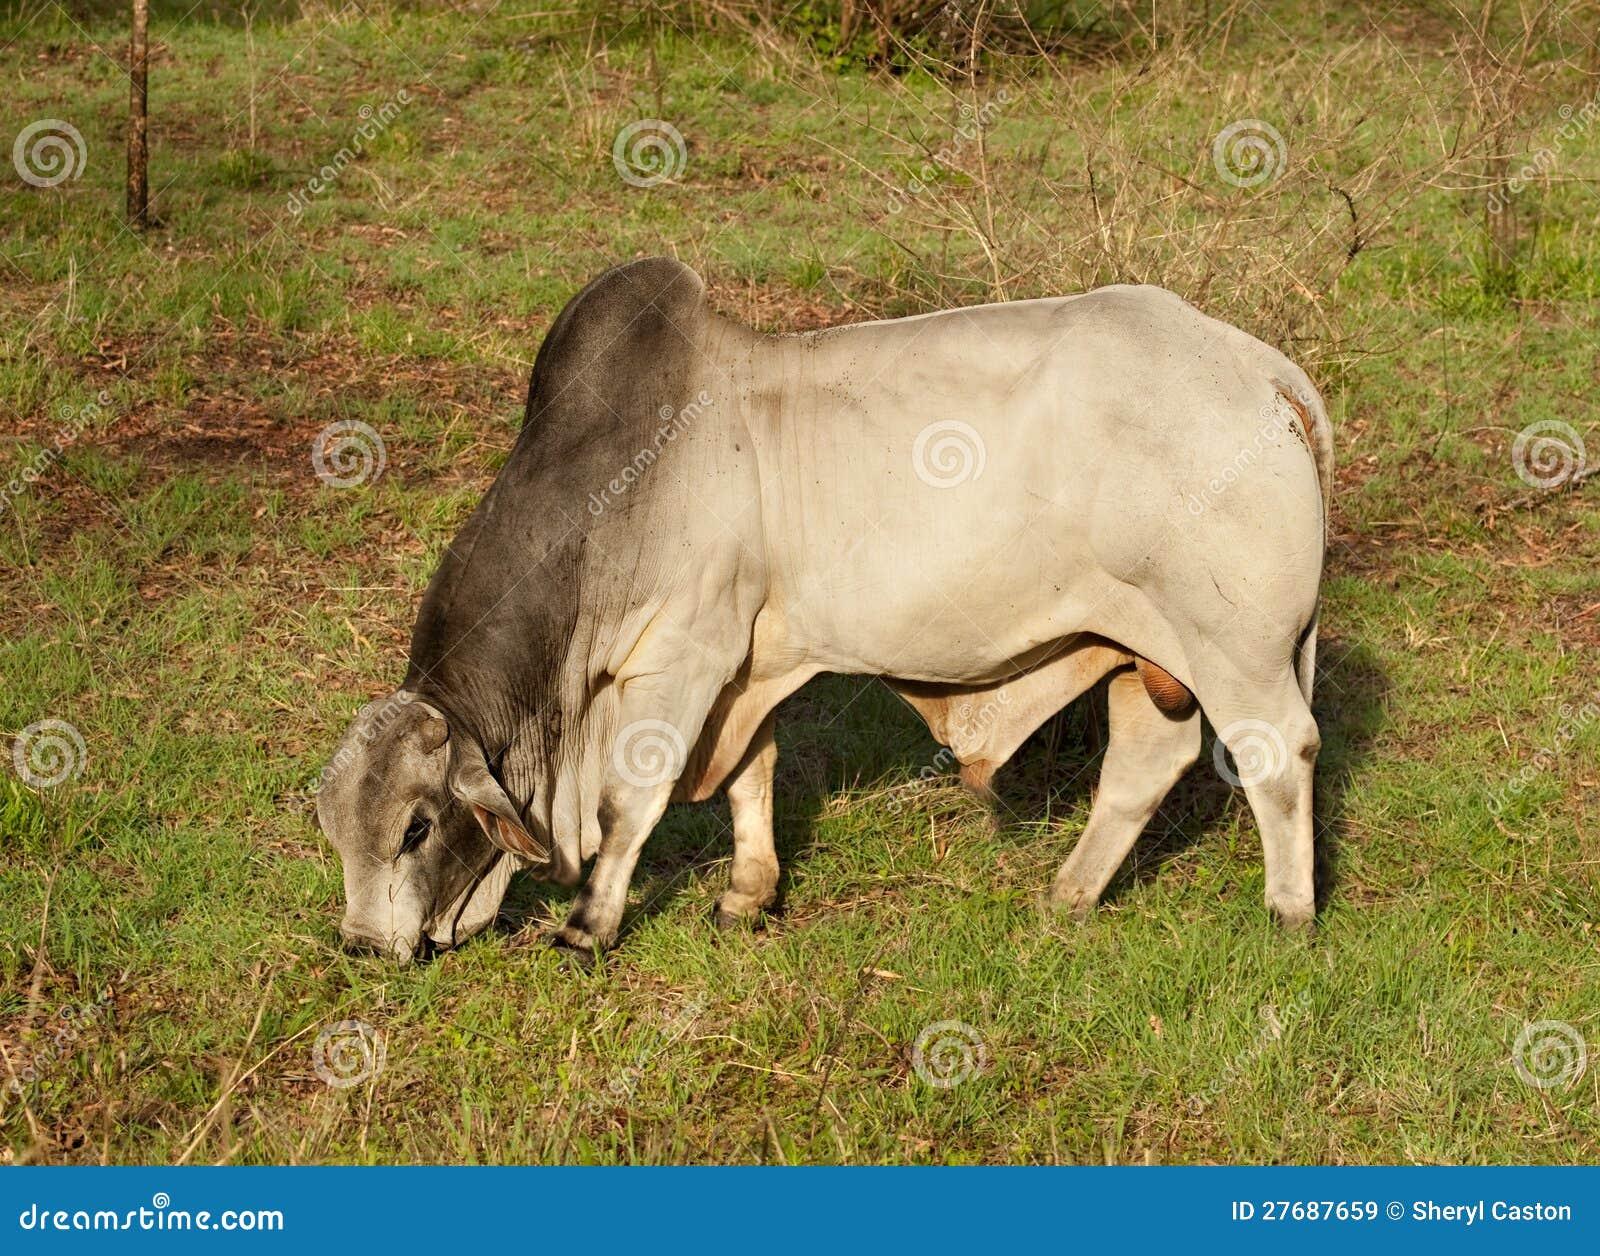 business plan allevamento bovini da carne